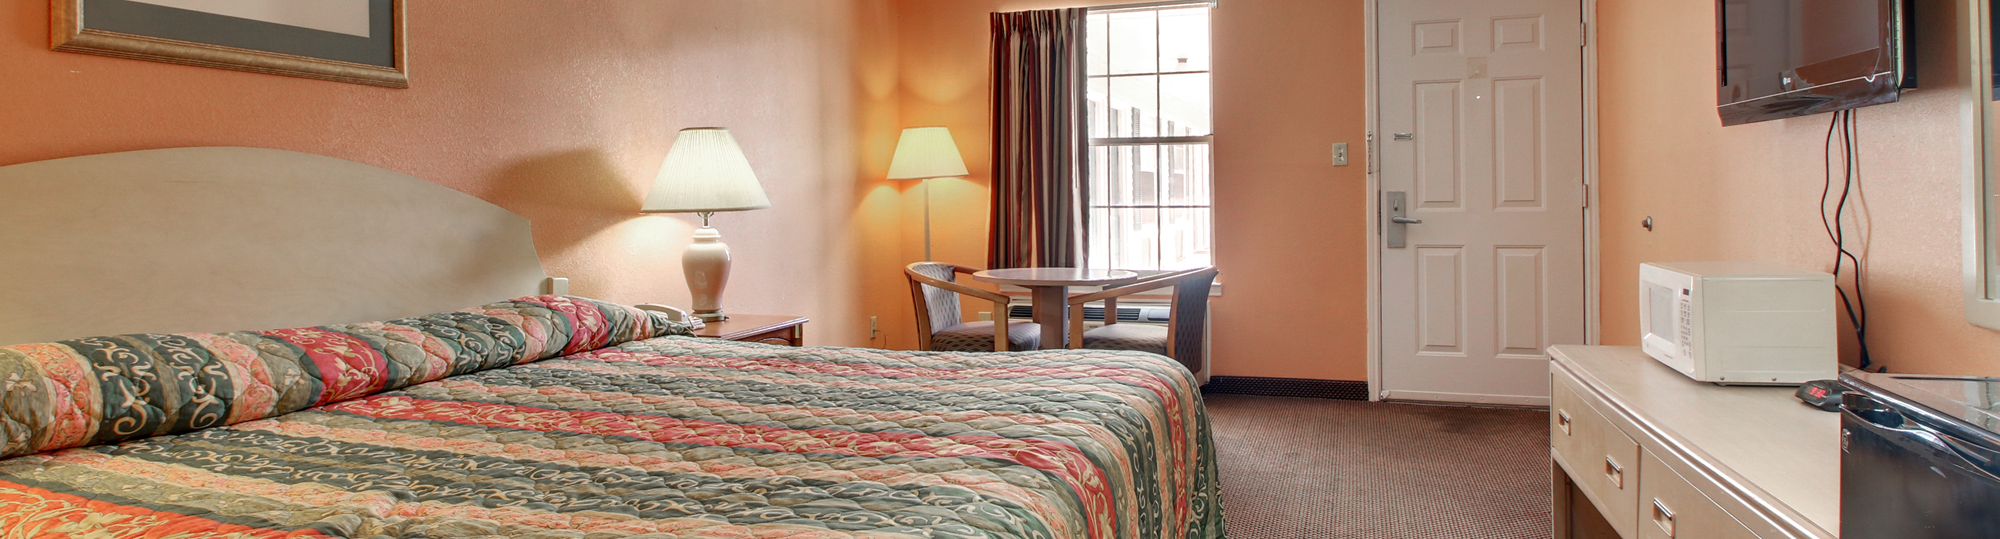 Key West Inn Hotels and Resorts Clanton